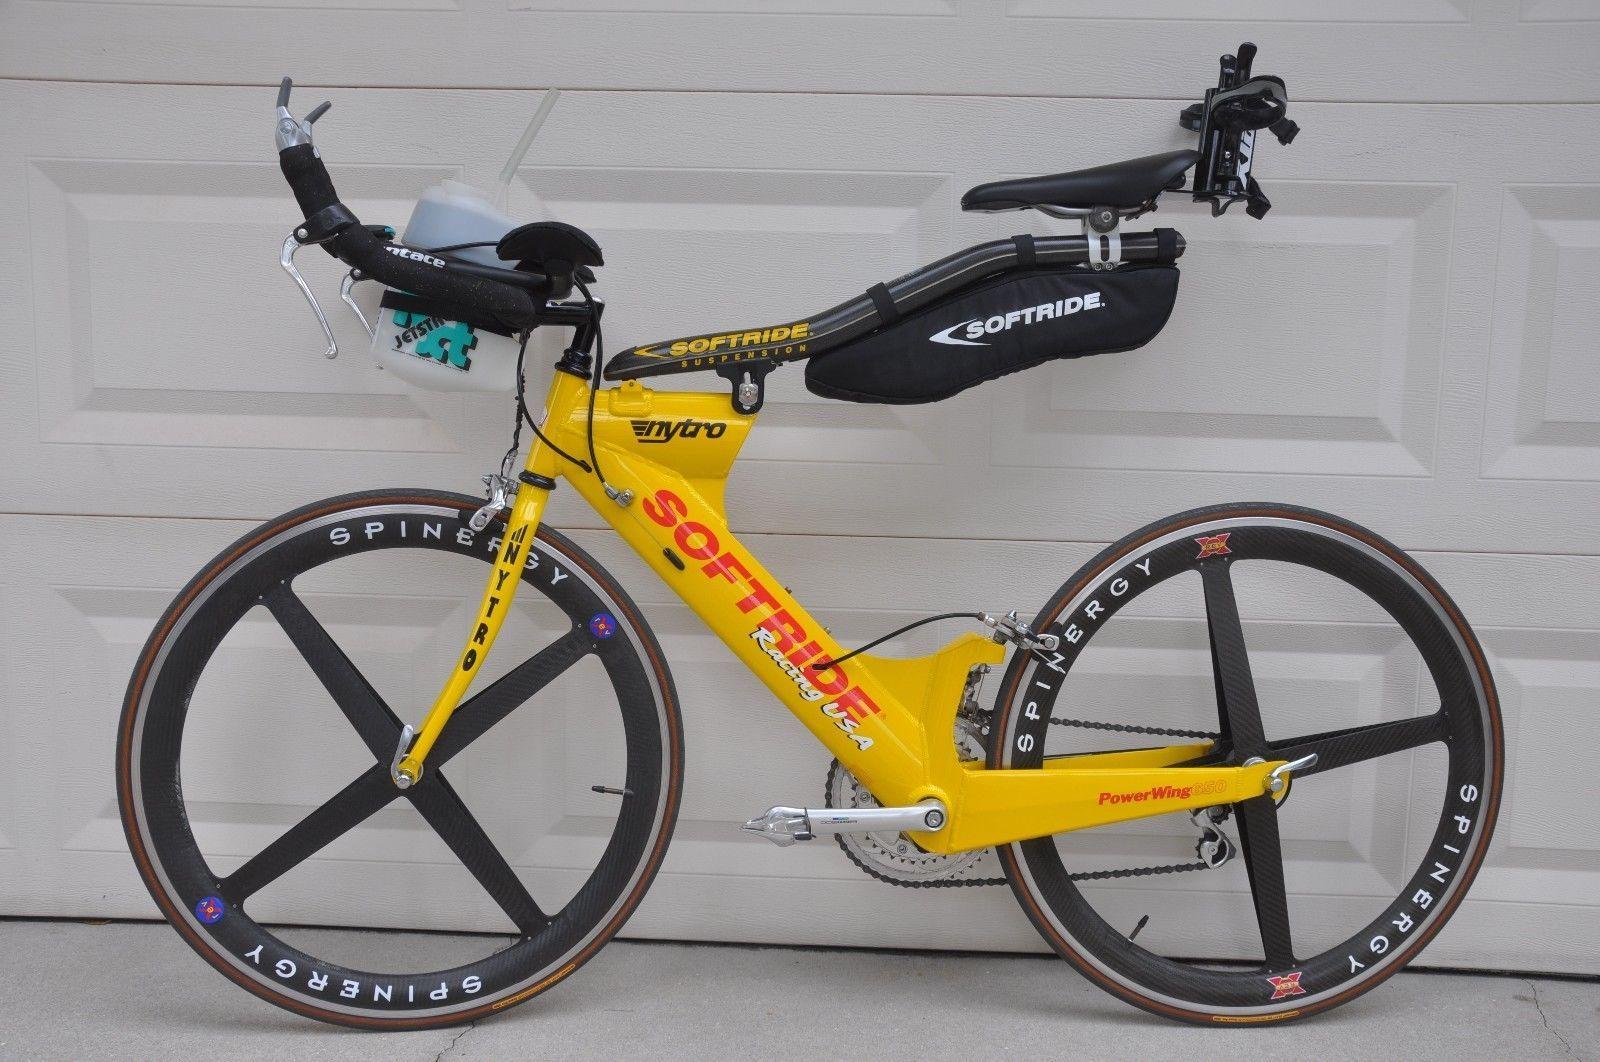 SOFTRIDE PowerWing 650 Triathlon Bike with Spinergy Rev-X Wheels ...